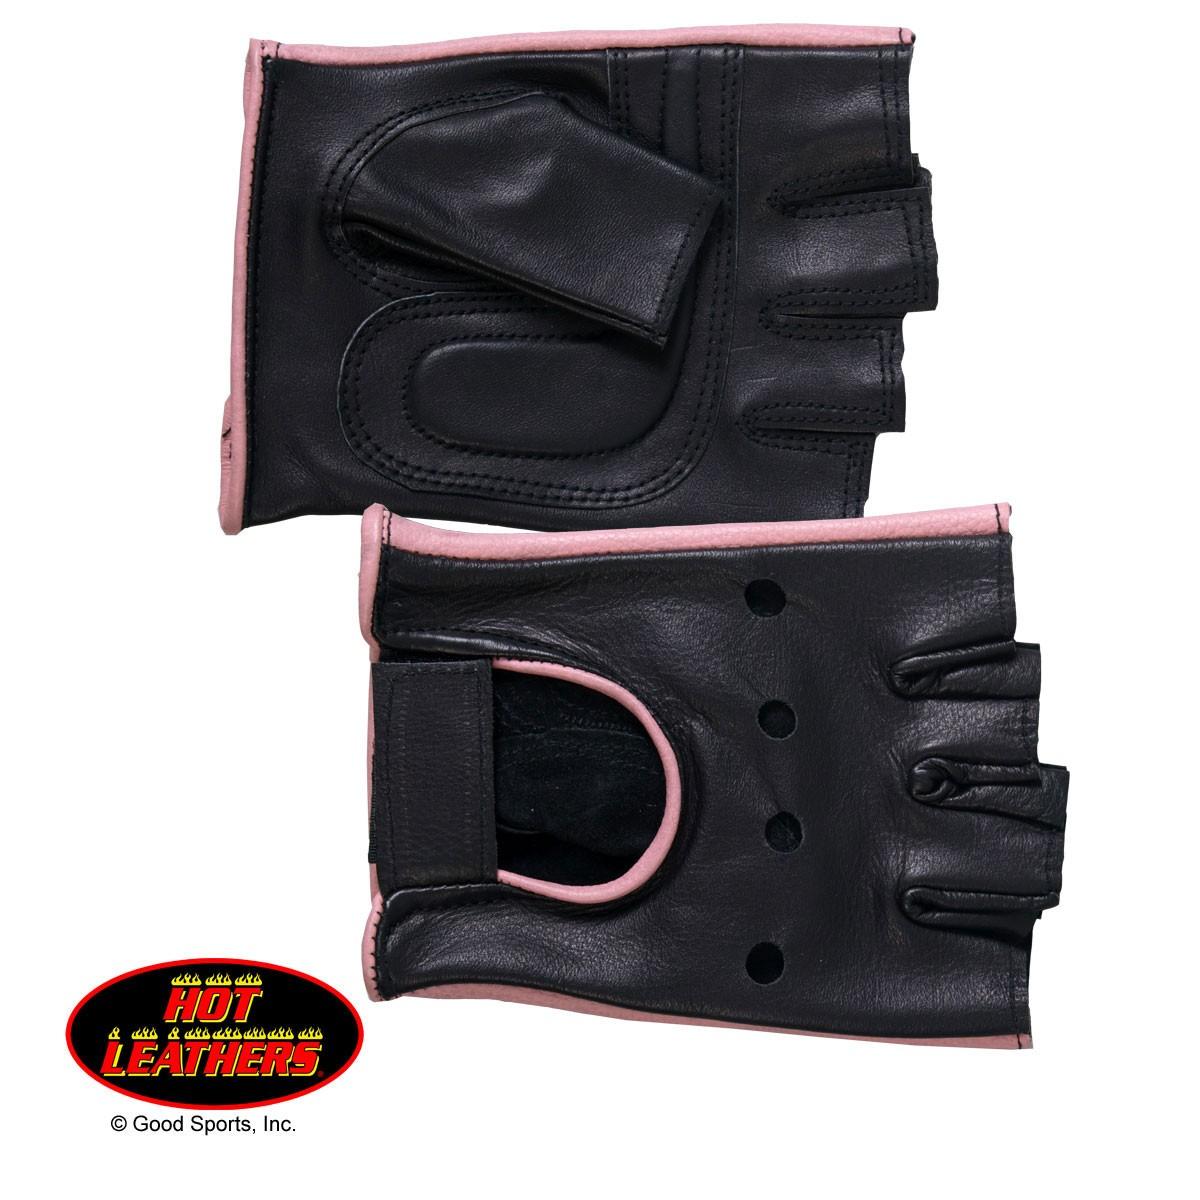 Hot Leathers Ladies Fingerless Gloves GVL1006